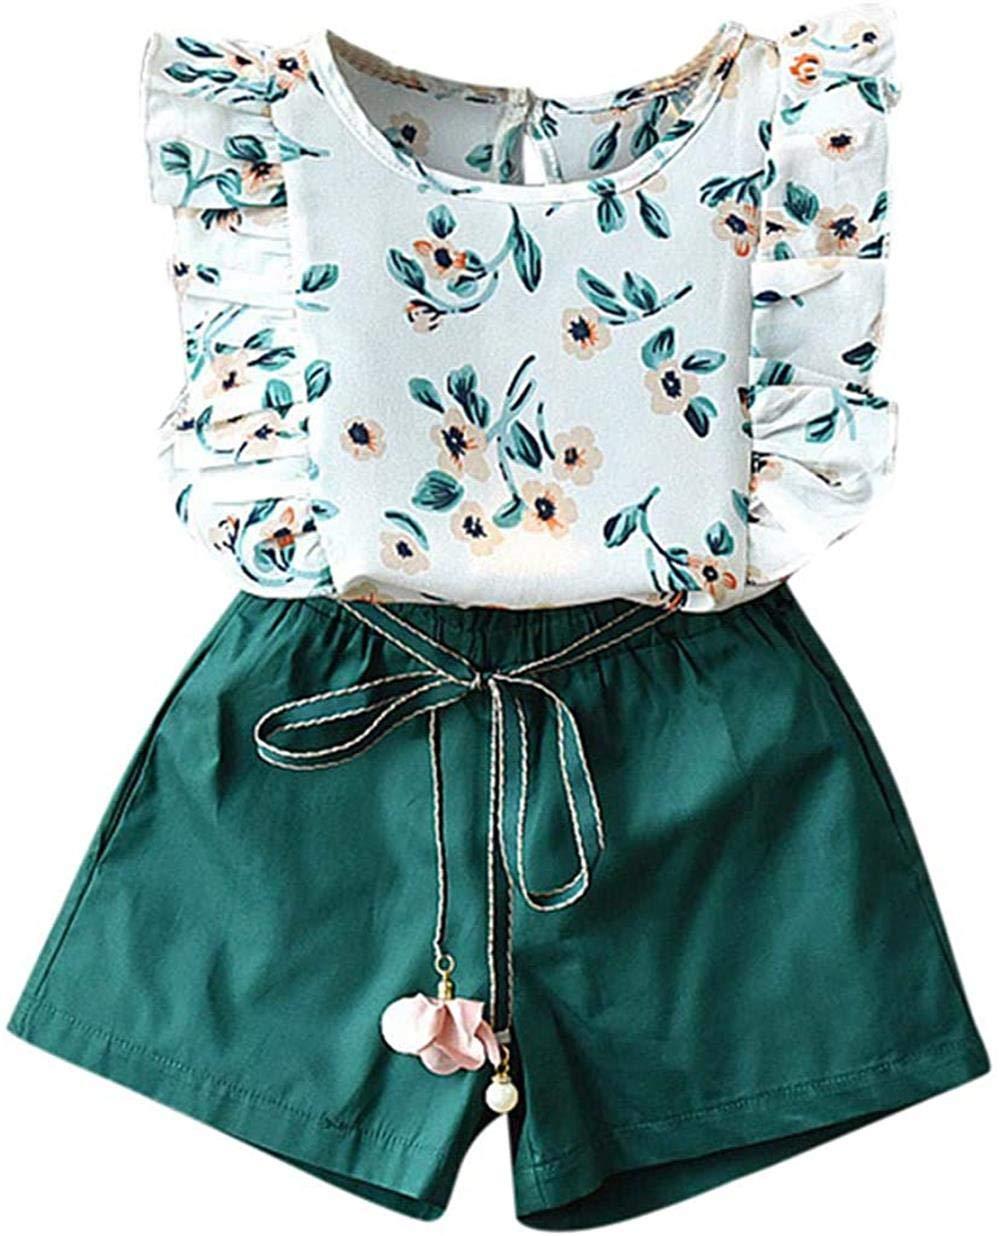 Toddler Baby Girl Summer Outfits Ruffle Flower Print T-Shirt 2-6T Kids Tops Bow Waistband Shorts 2Pcs Sets